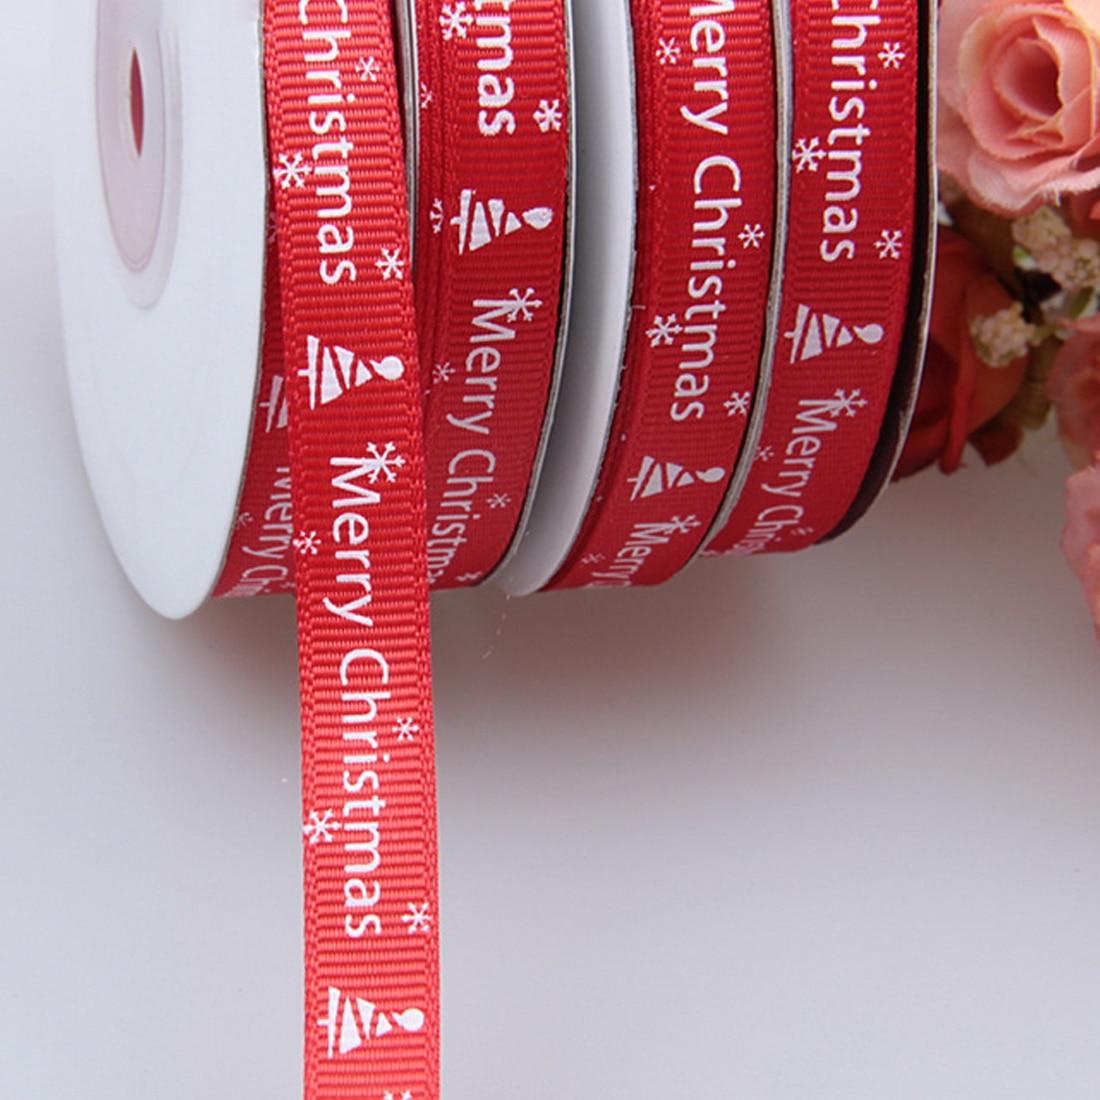 Home 25 Yards/1cm Red Thread Printed Ribbon Handmade Merry Christmas Gift Wrap Ribbon DIY Decoration Material